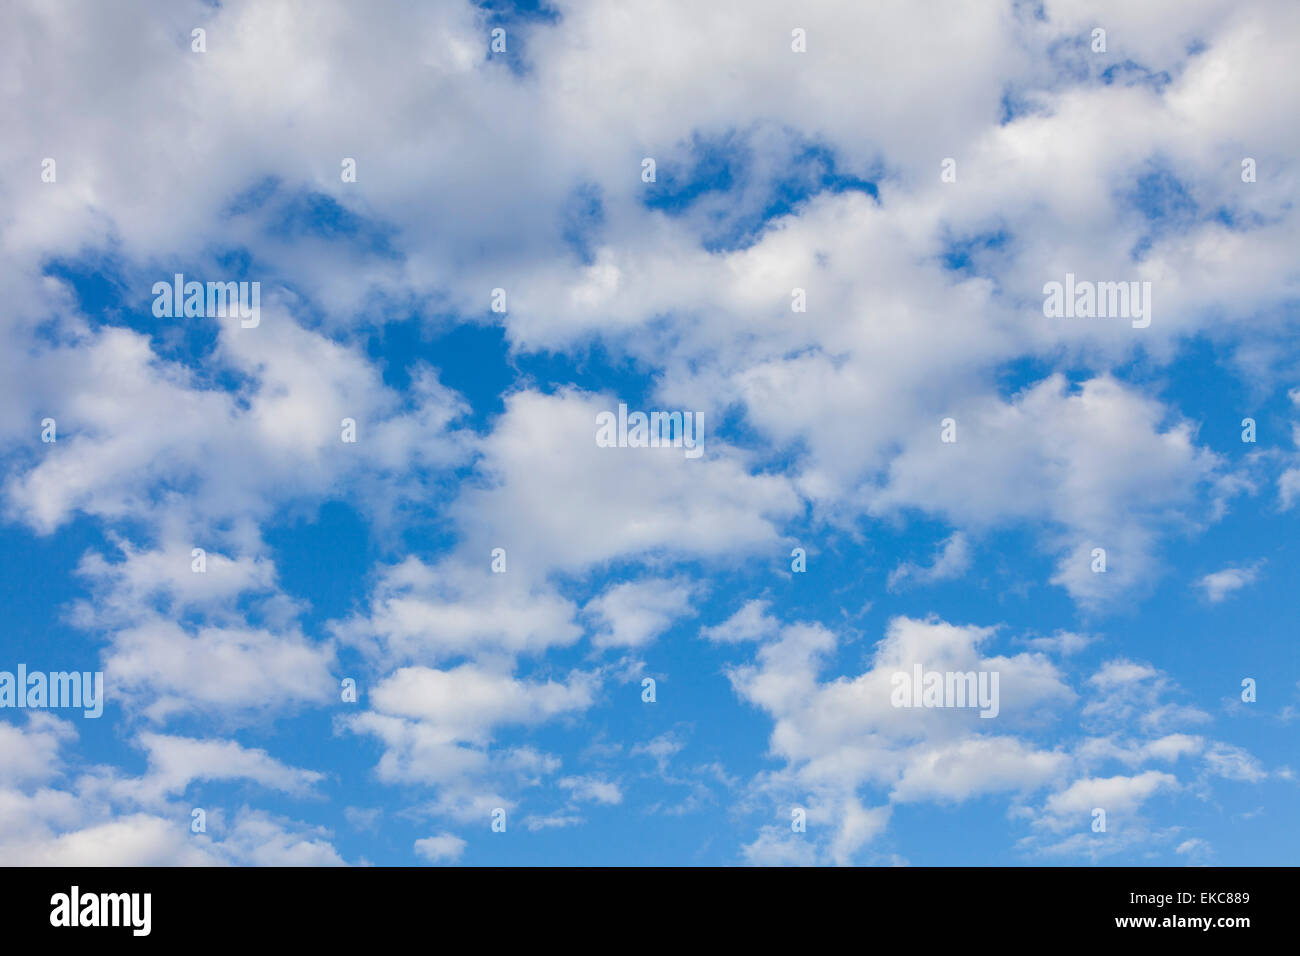 Cloud, Altocumulus clouds, fluffy clouds, - Stock Image